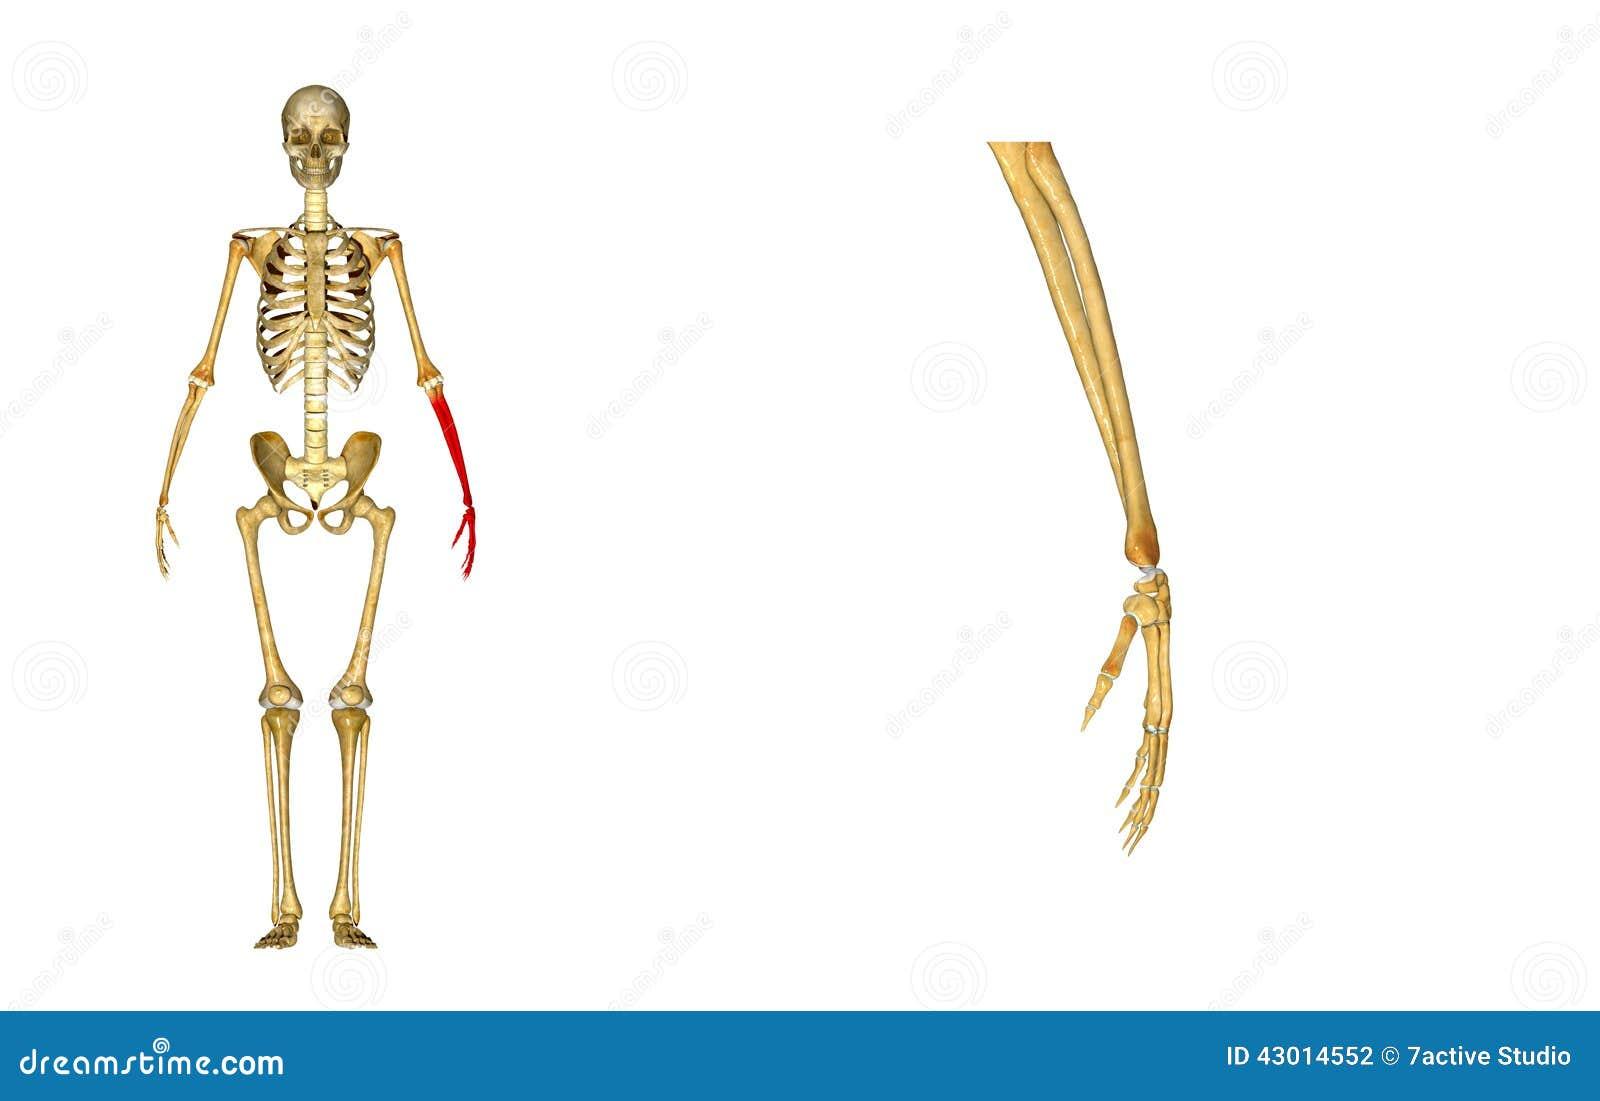 Skeleton: hand bone stock illustration. Illustration of health ...